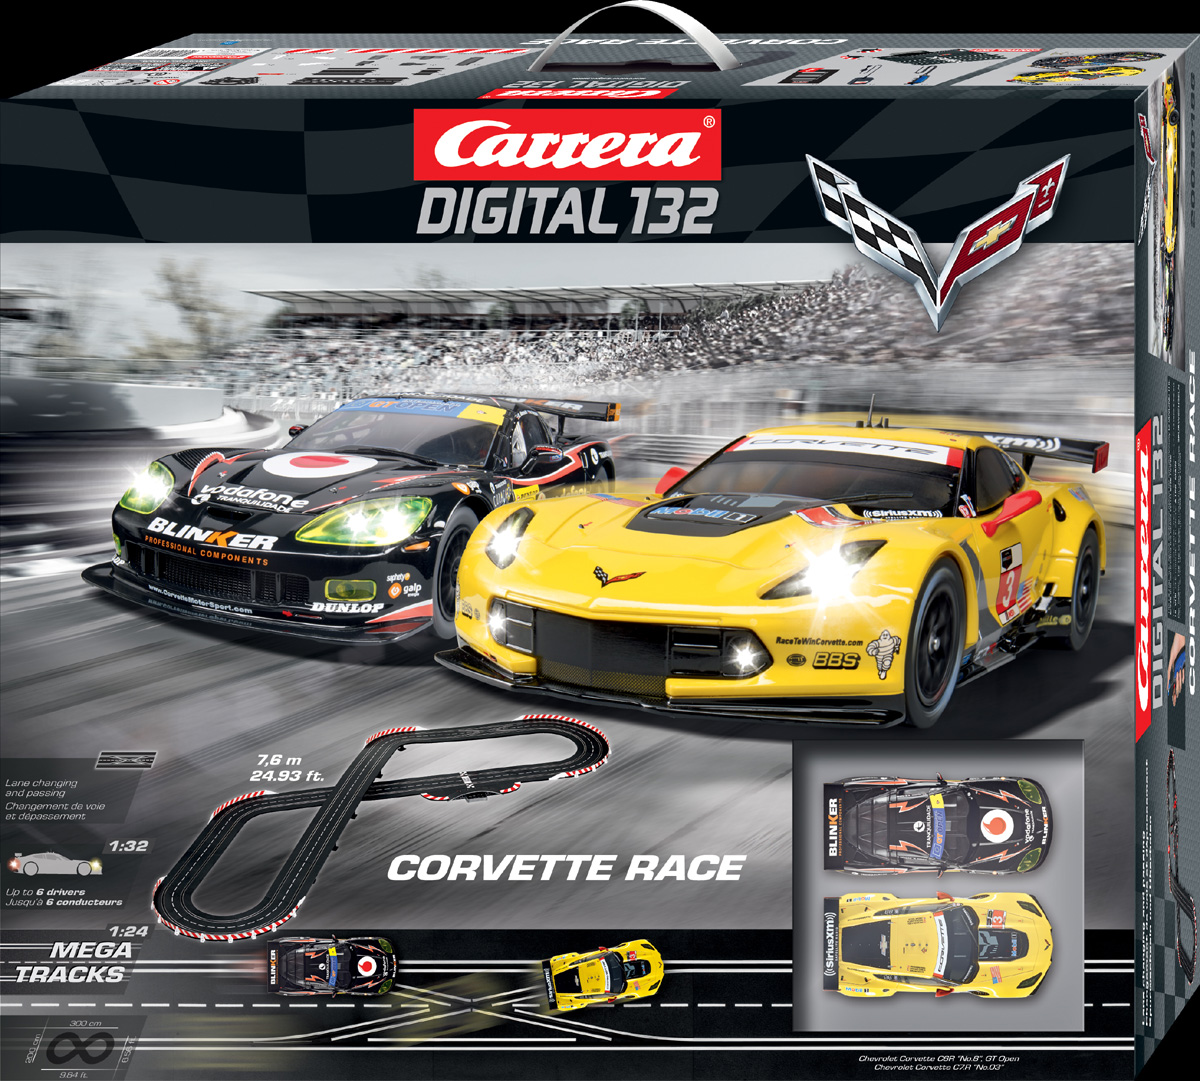 Carrera 30186 Corvette Race Set Digital 132 [30186]